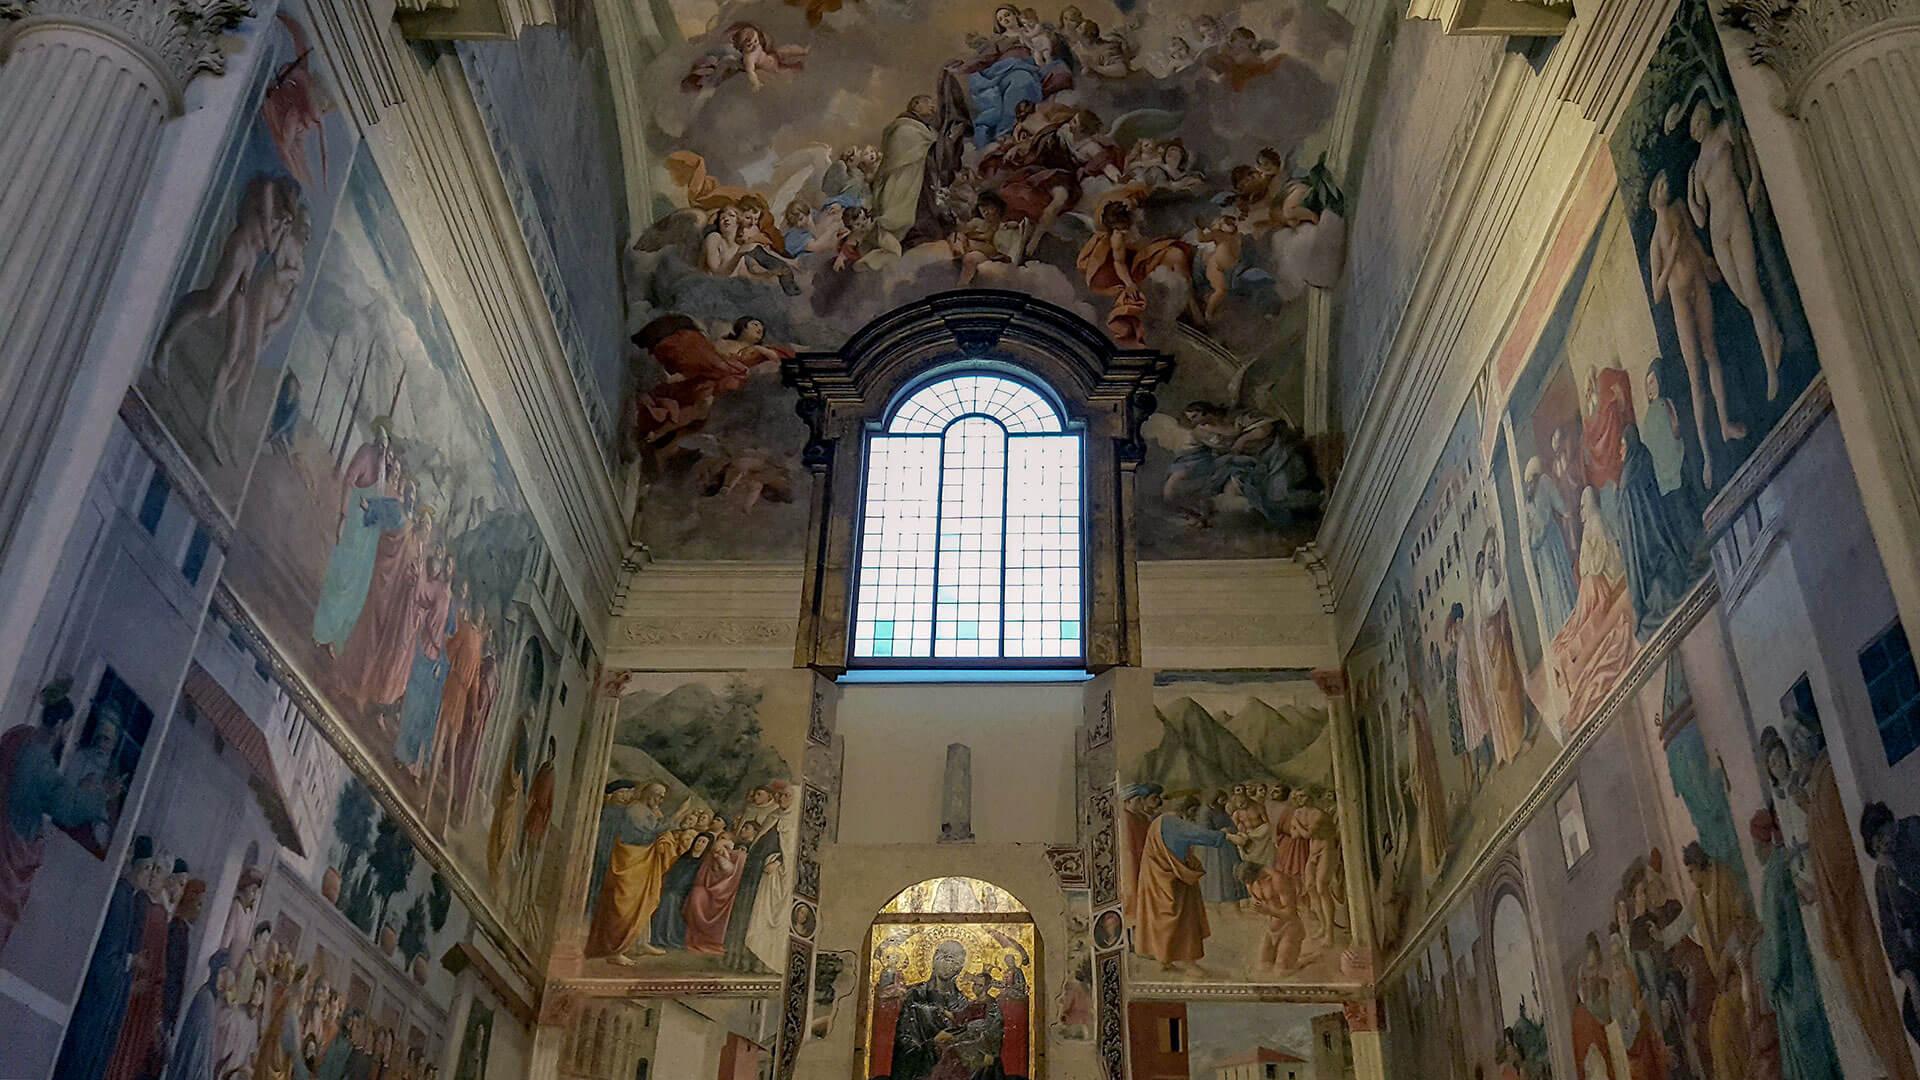 Brancacci Chapel Florence